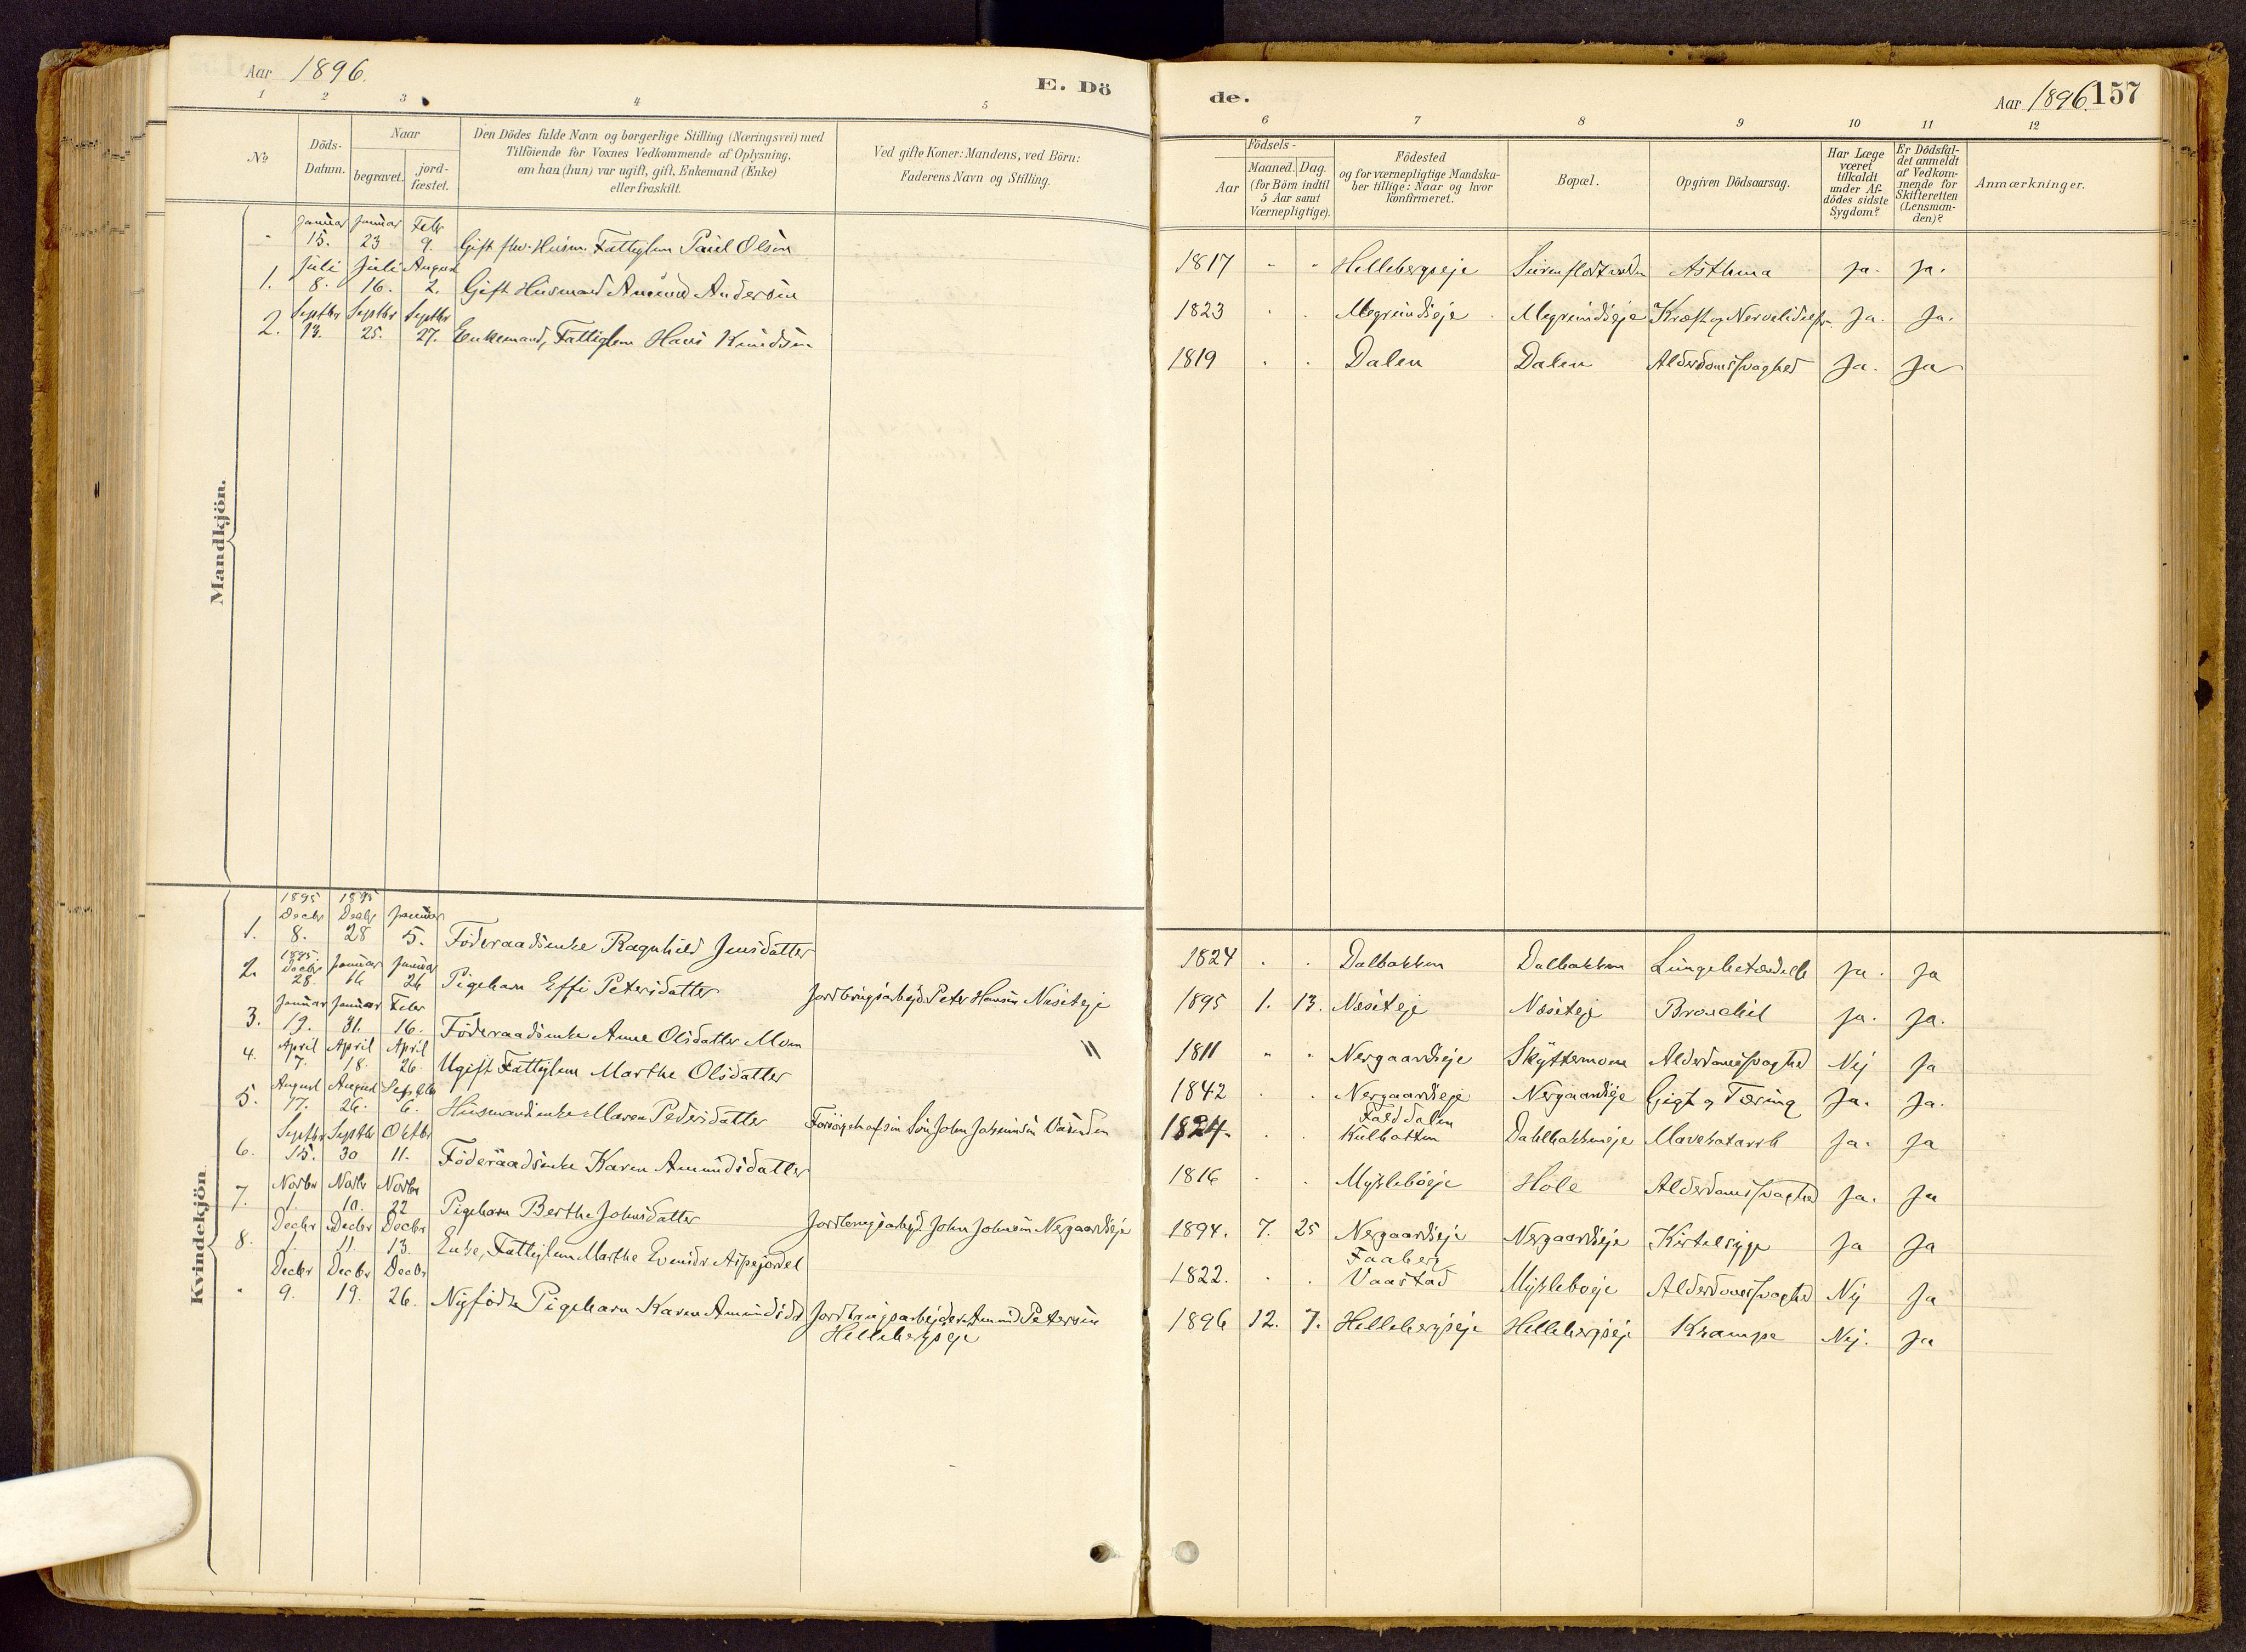 SAH, Vestre Gausdal prestekontor, Ministerialbok nr. 2, 1887-1918, s. 157